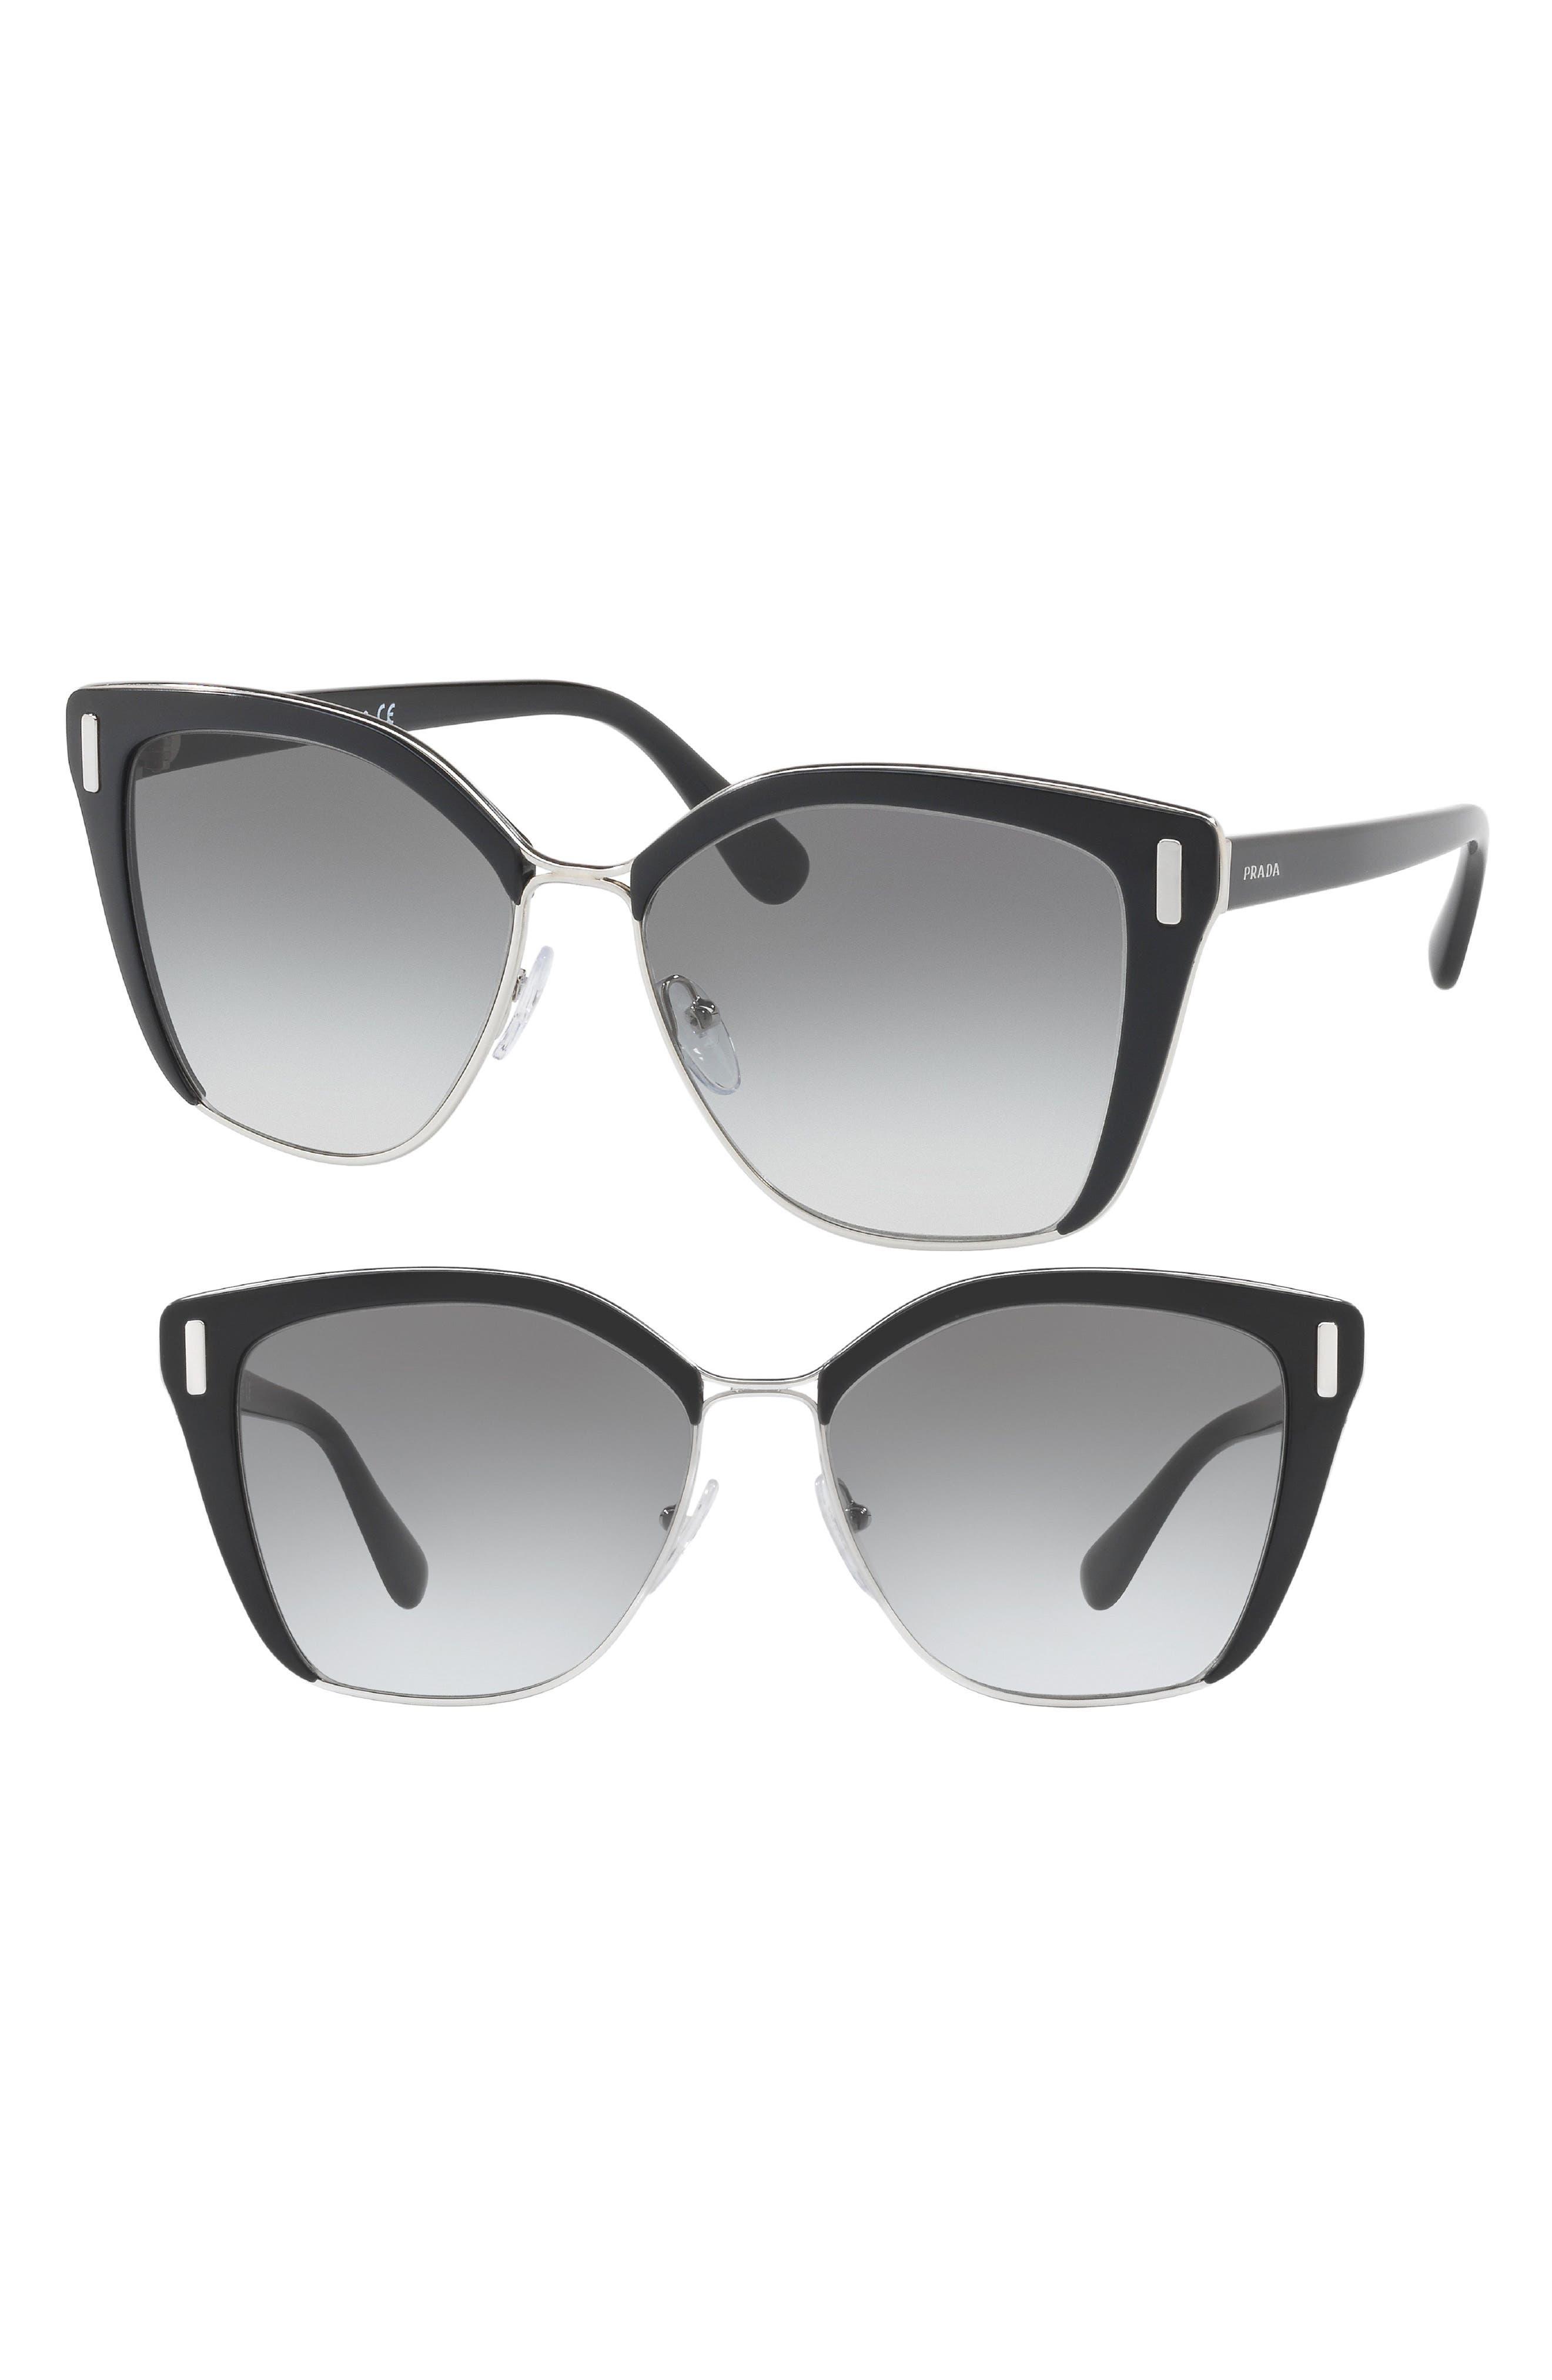 57mm Gradient Geometric Sunglasses,                             Main thumbnail 1, color,                             008